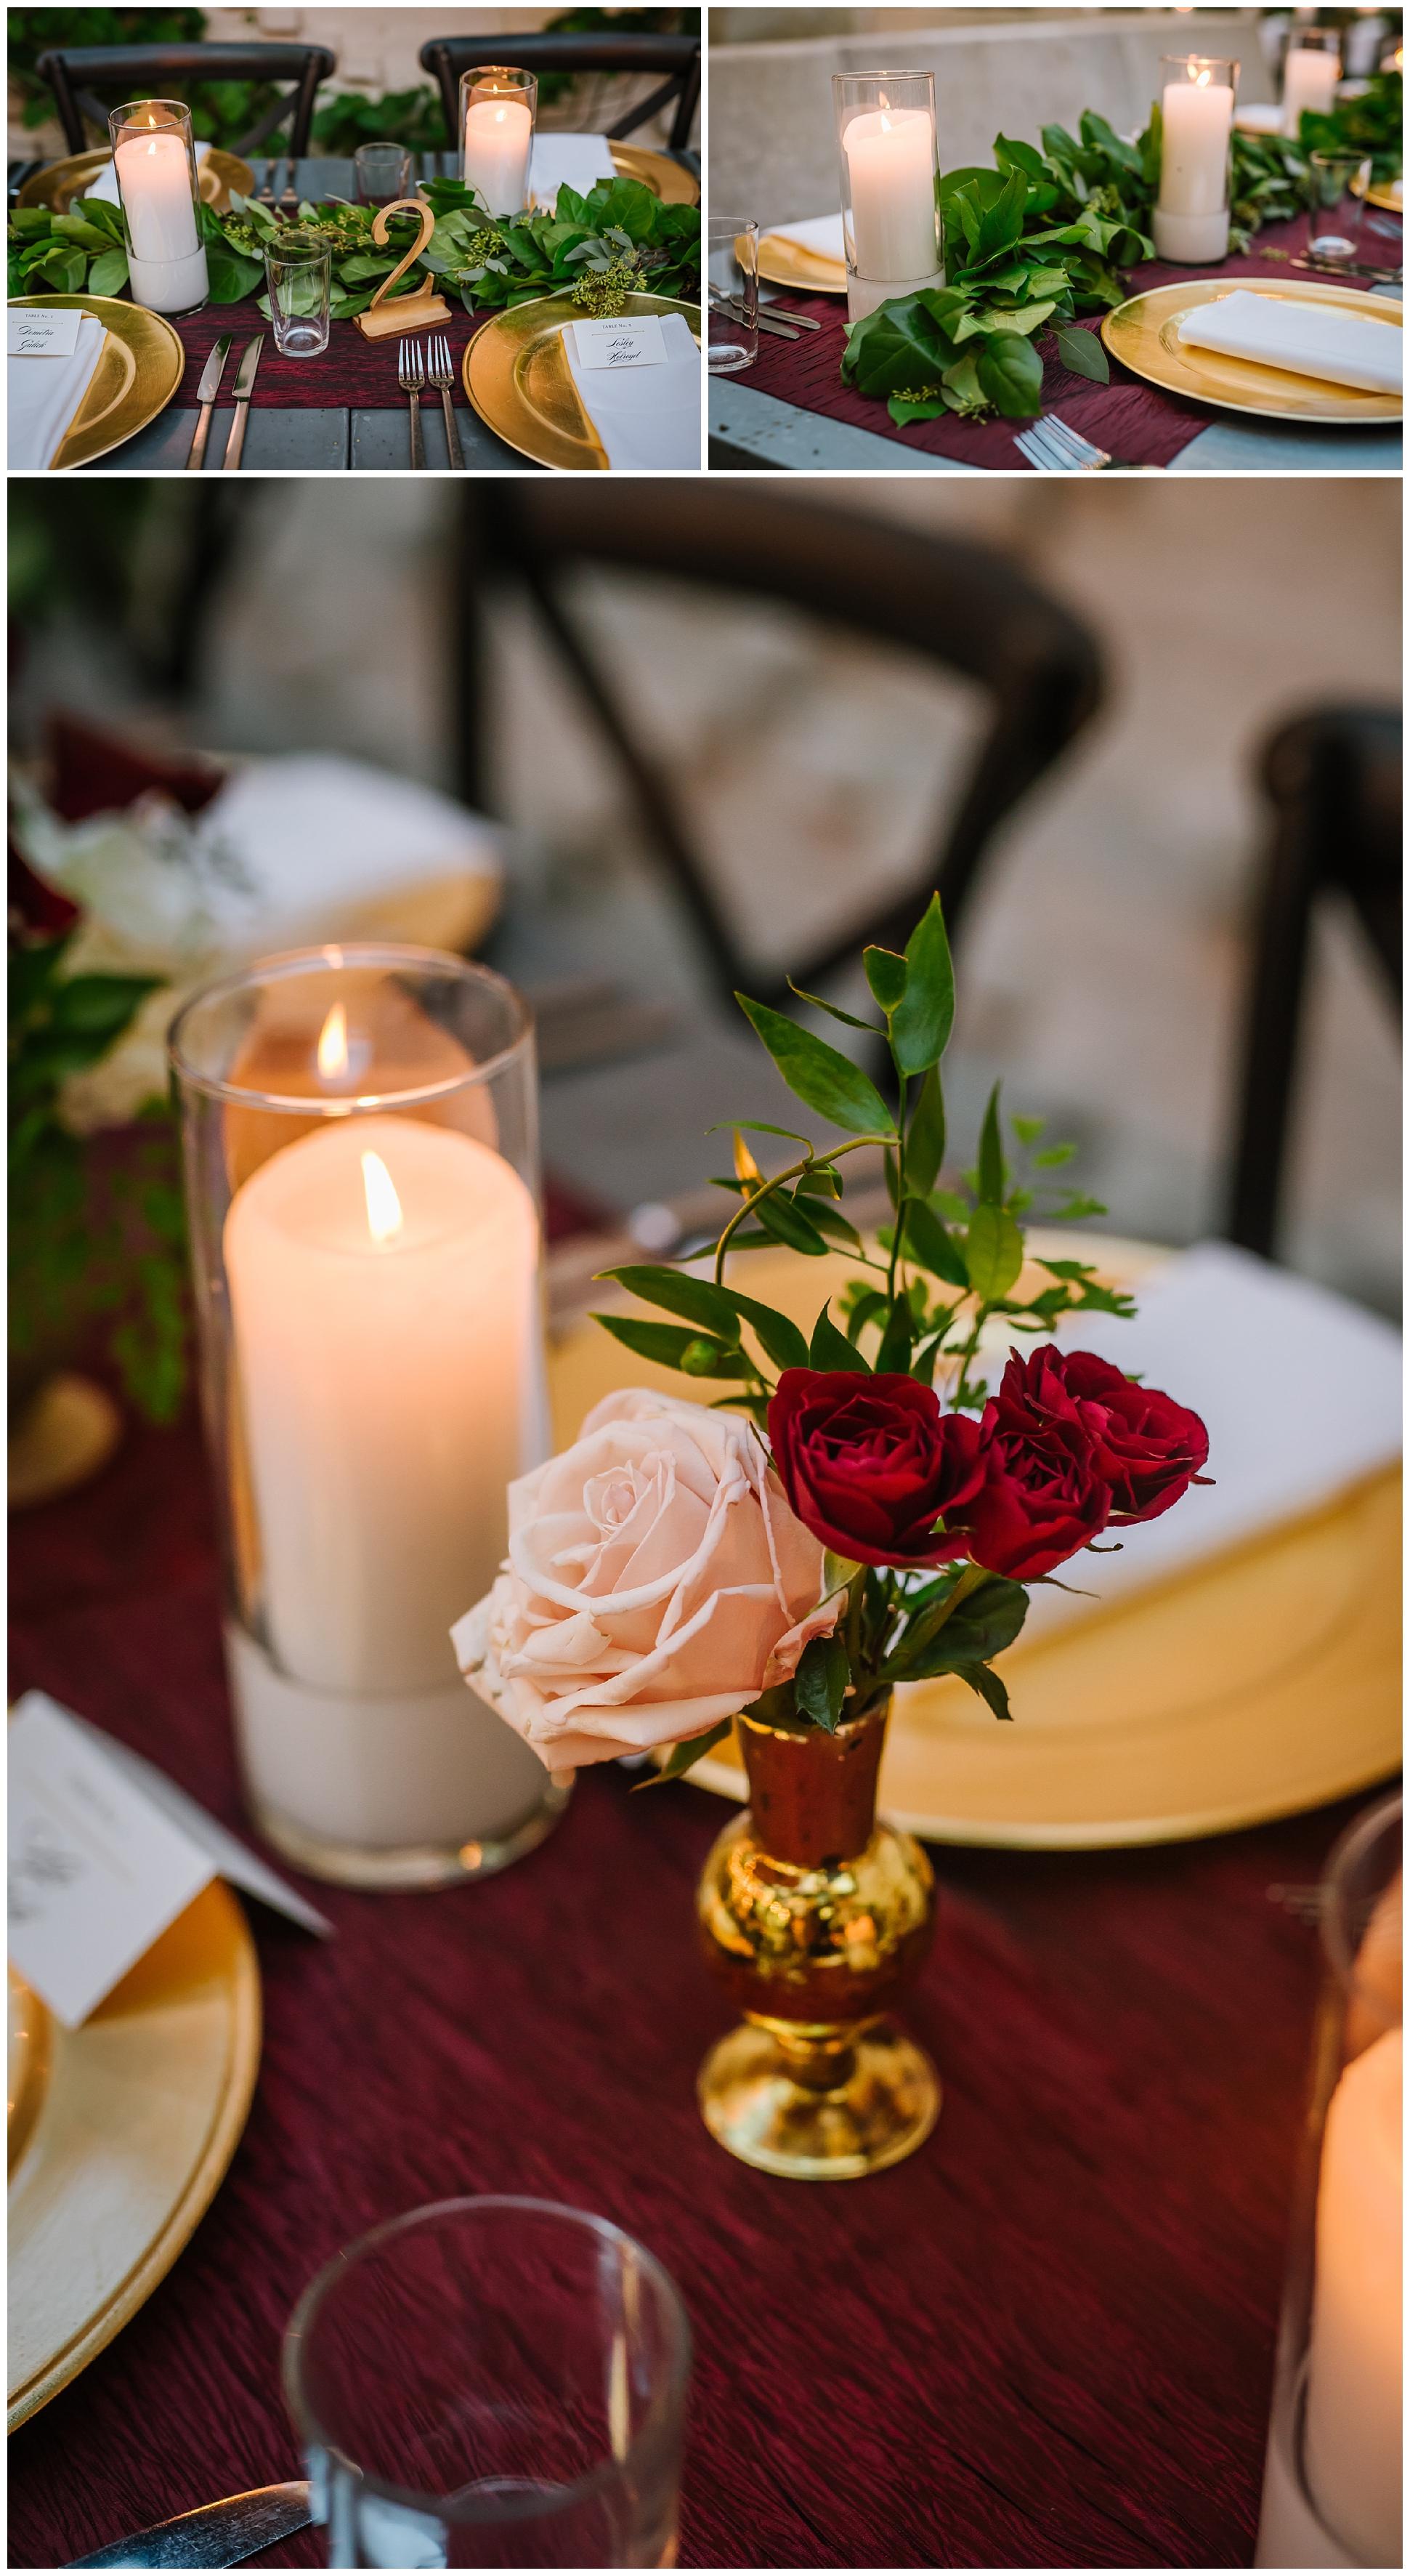 Oxford-exchange-wedding-photogapher-garland-candels-bookstore-burgandy-botanica_0043.jpg